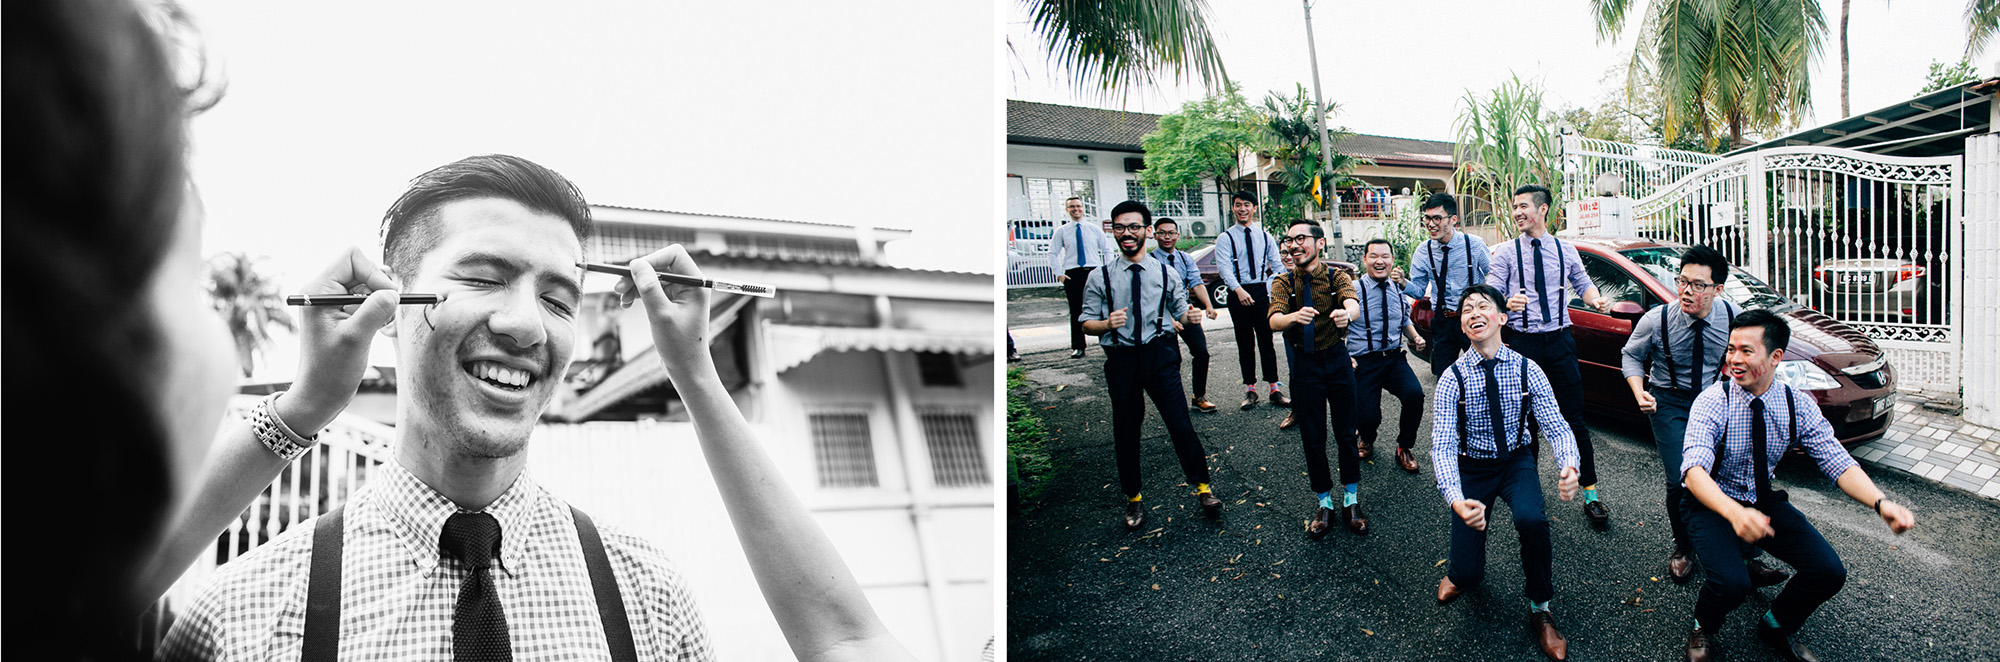 23-hellojanelee-sam grace-malaysia-wedding-day